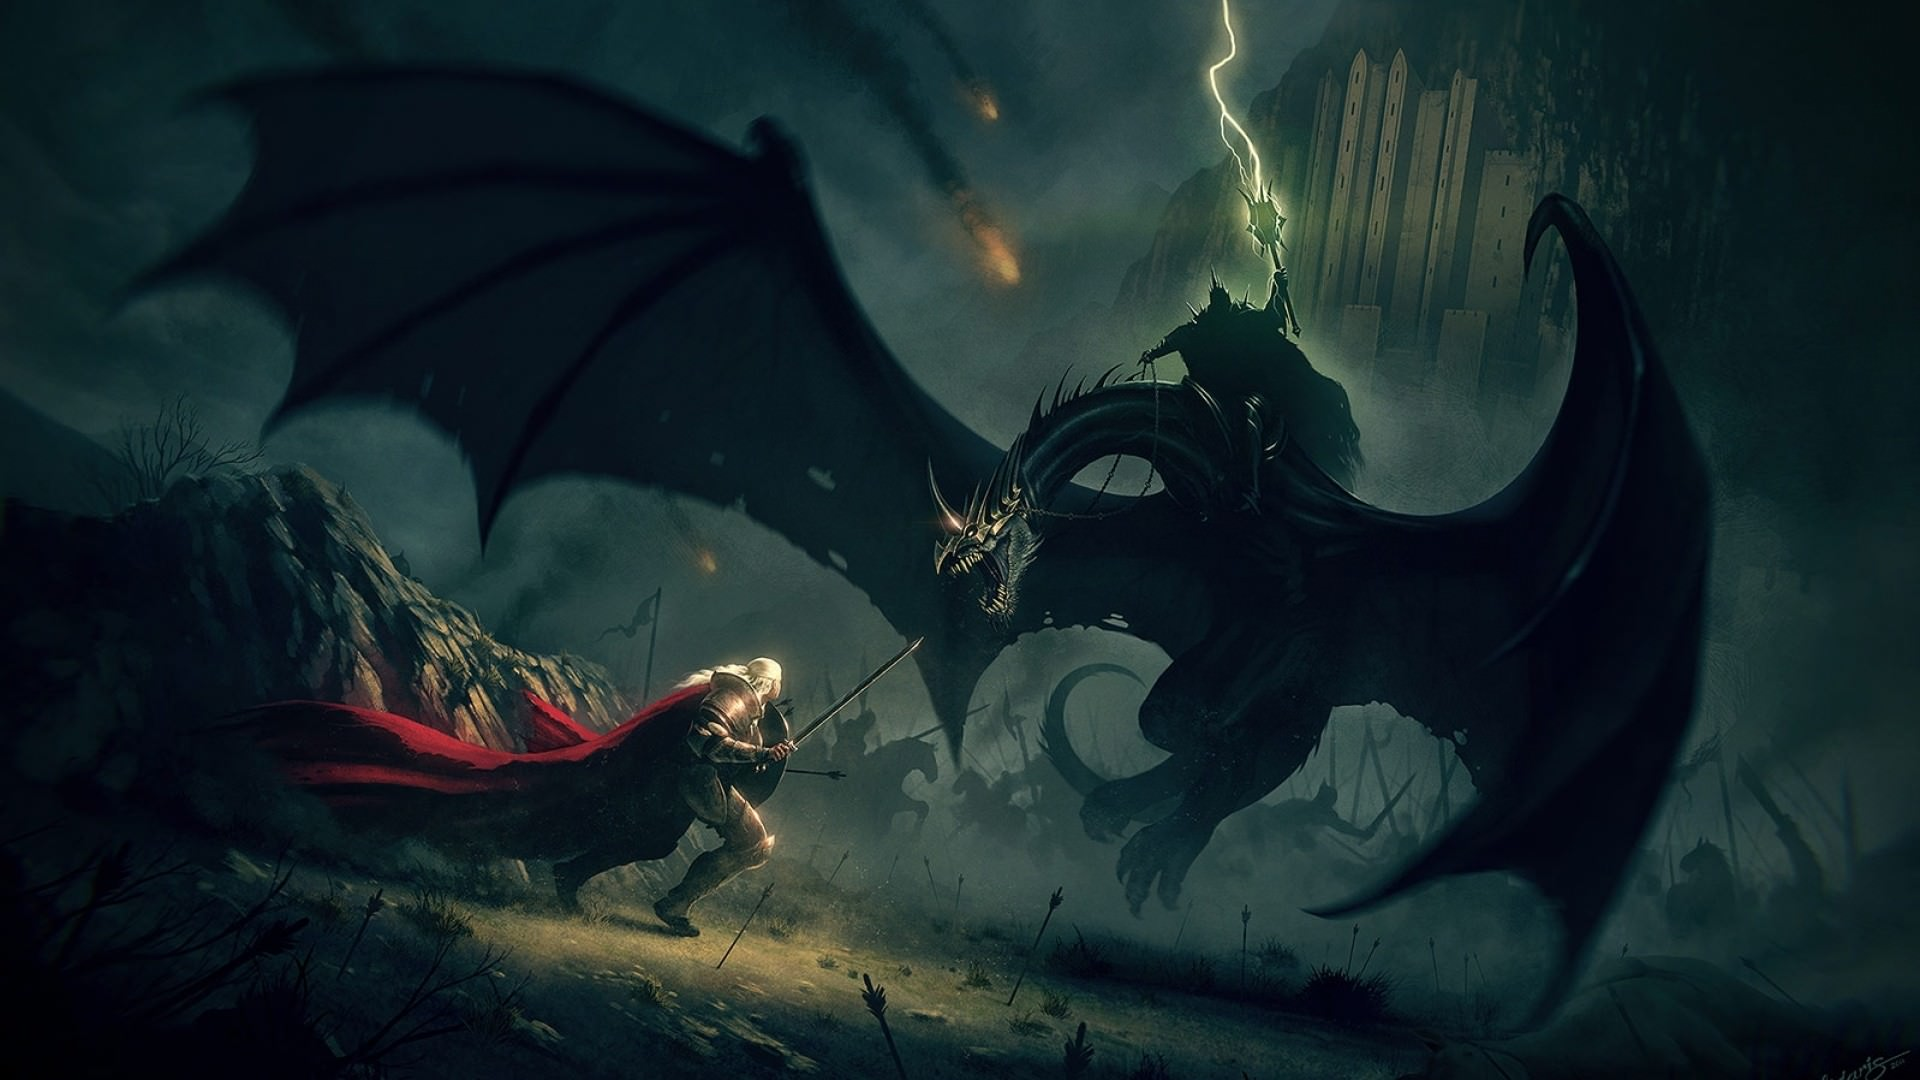 Eowyn Minas Tirith Lord of the Rings Wallpaper   DigitalArtio 1920x1080